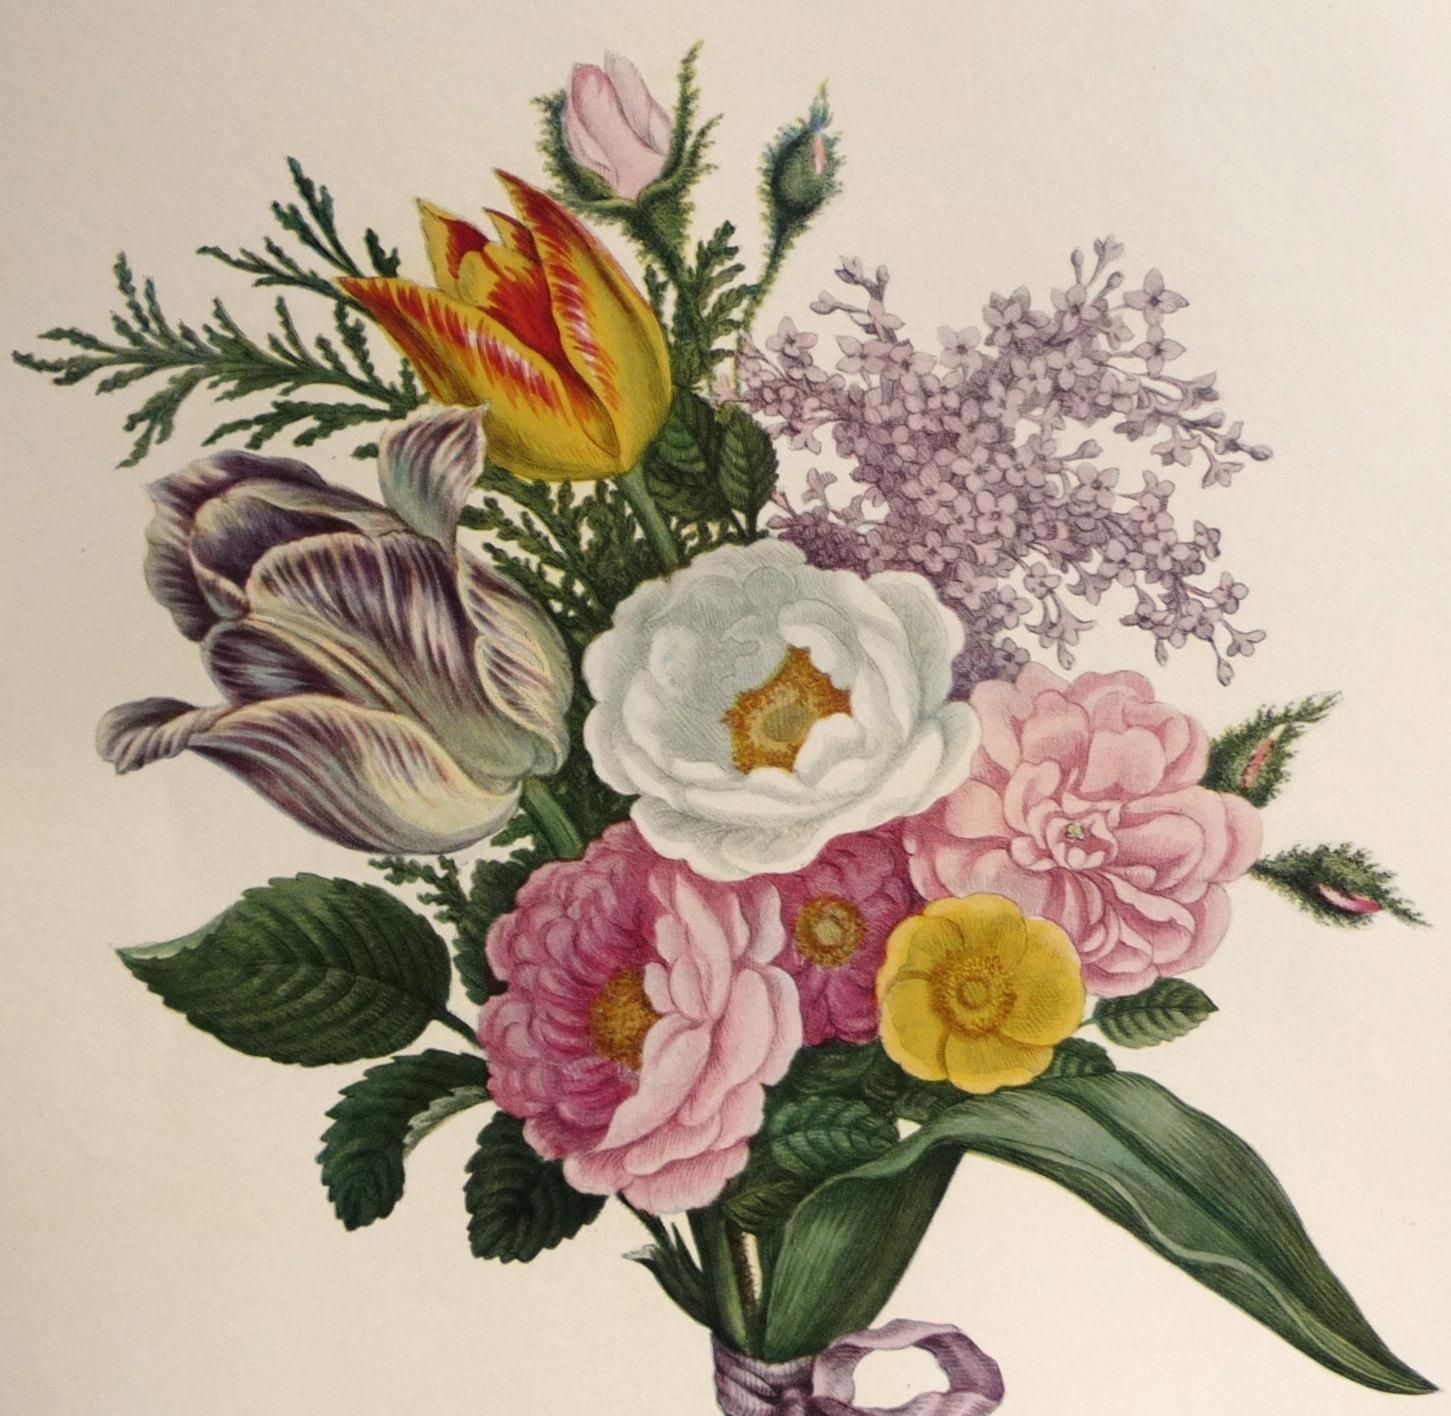 Drawn vintage flower free hand drawing Pinterest vintage Botanical Pin and